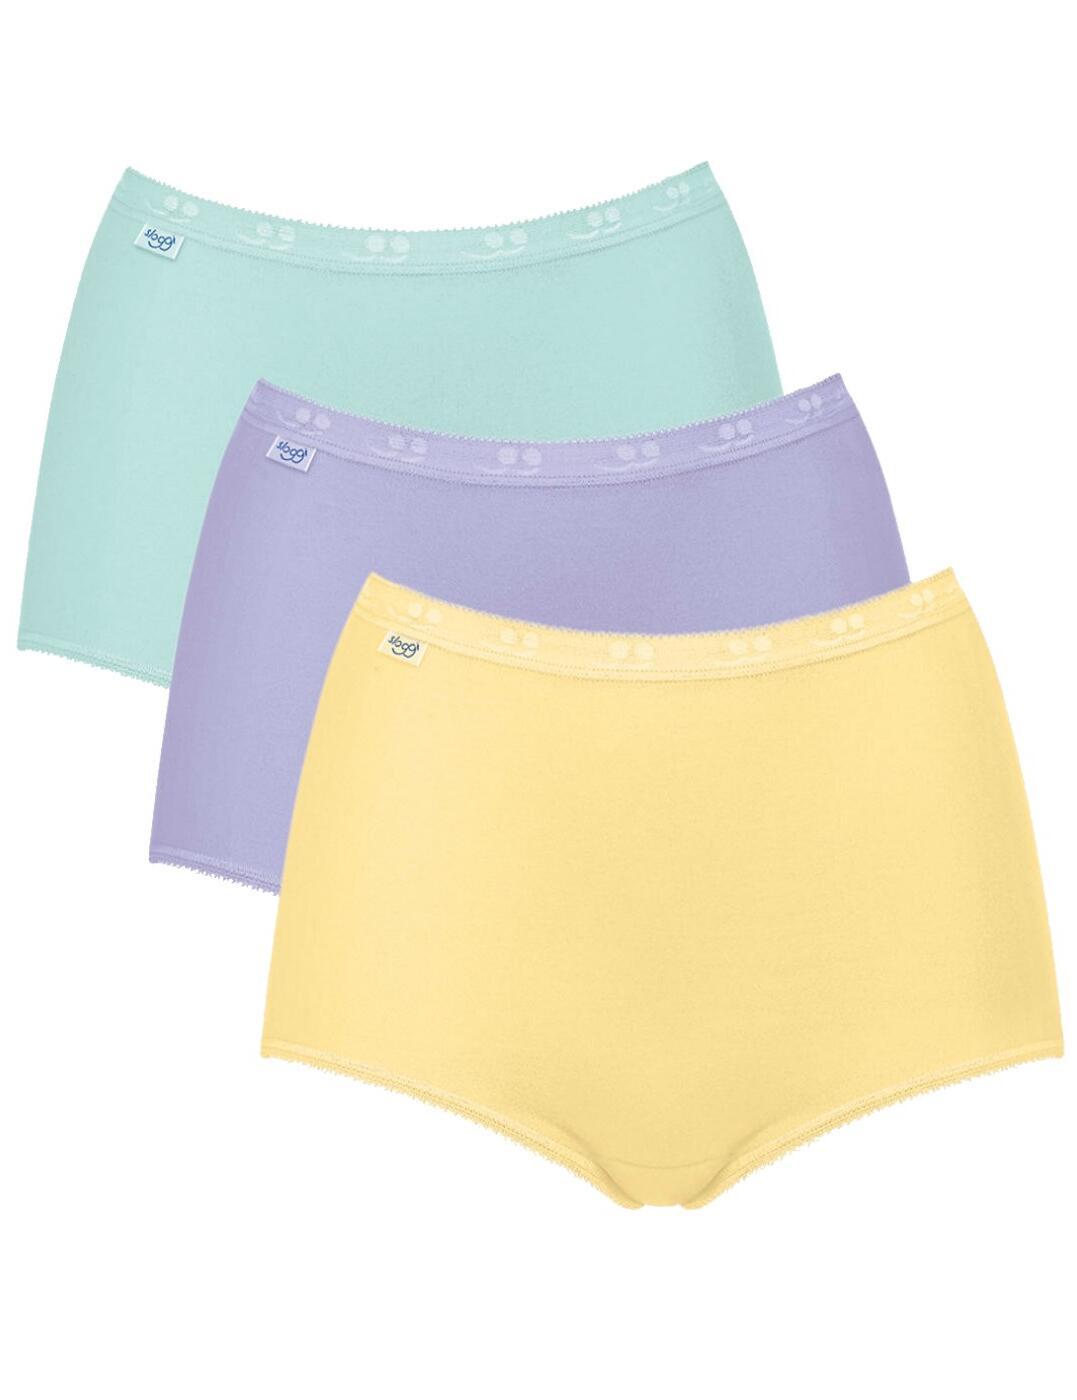 10105593 Sloggi Basic Maxi Brief 3 Pack - 10105593 Yellow/Light Combination (Pastel Colours)